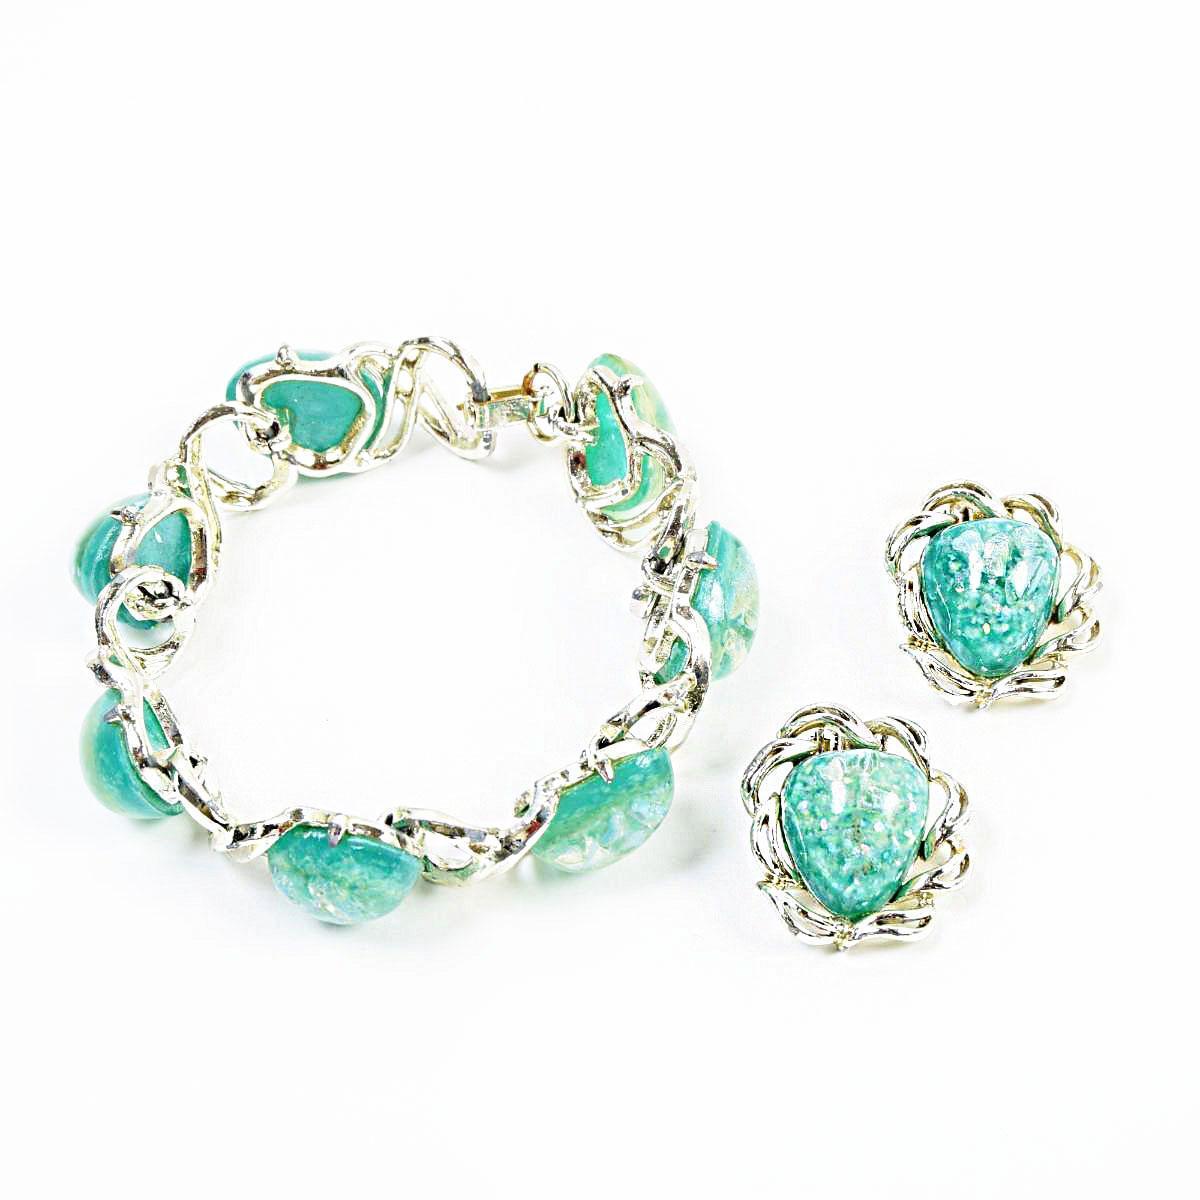 e358f76f6 VINTAGE CLOTHING JAM: Costume jewelry two points set Lucite bracelet ...